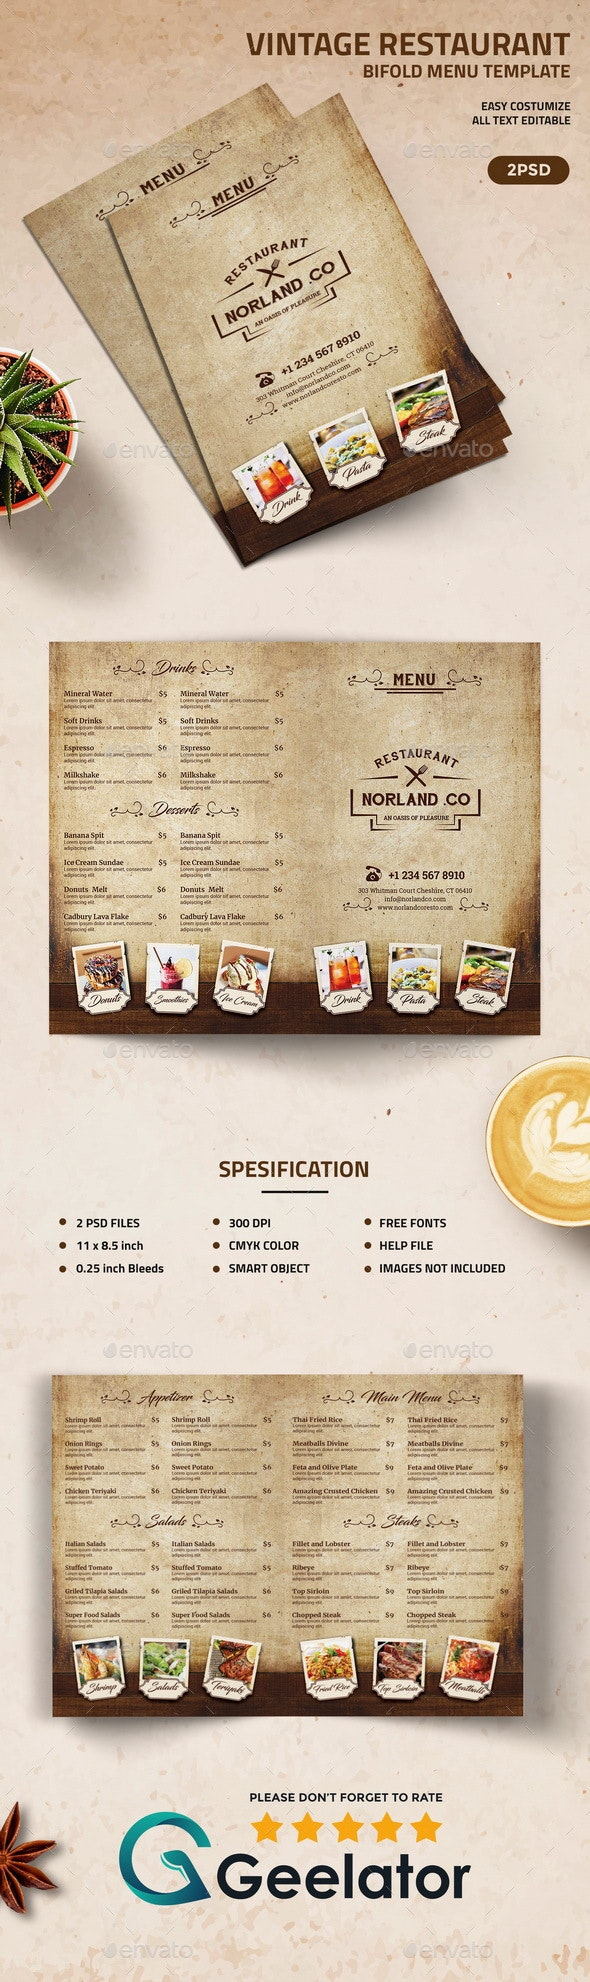 Vintage BiFold Restaurant Menu Template - Food Menus Print Templates